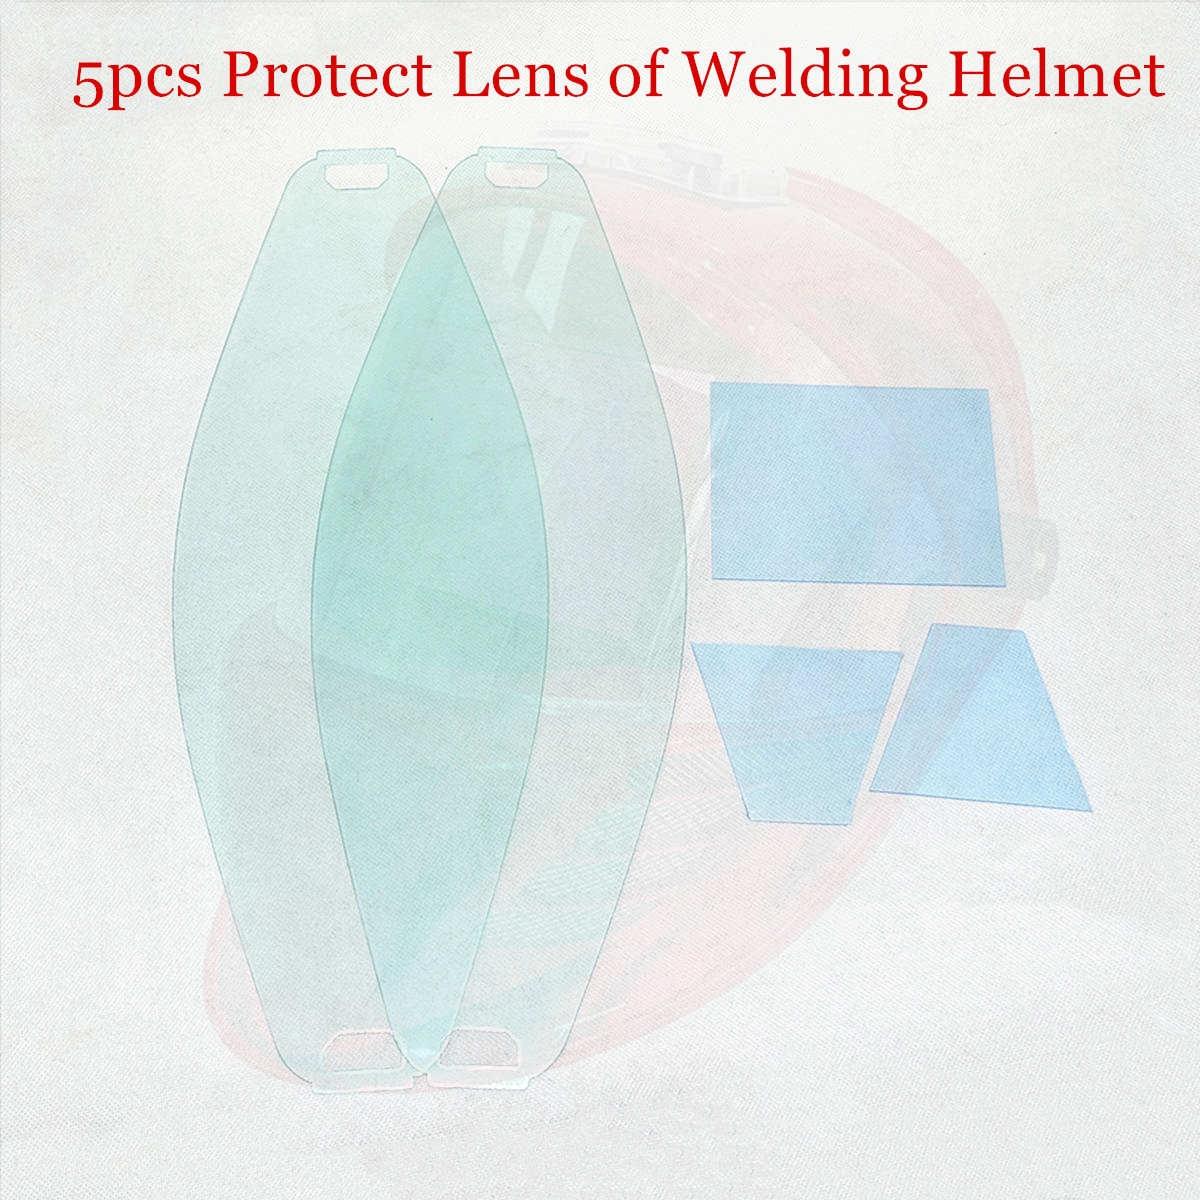 Protect Lens Front Inner Cover Lens 5pcs/set For 3 View Window Auto Darkening Welding Mask CE ANSI CSA AS/NZS Welding Helmet